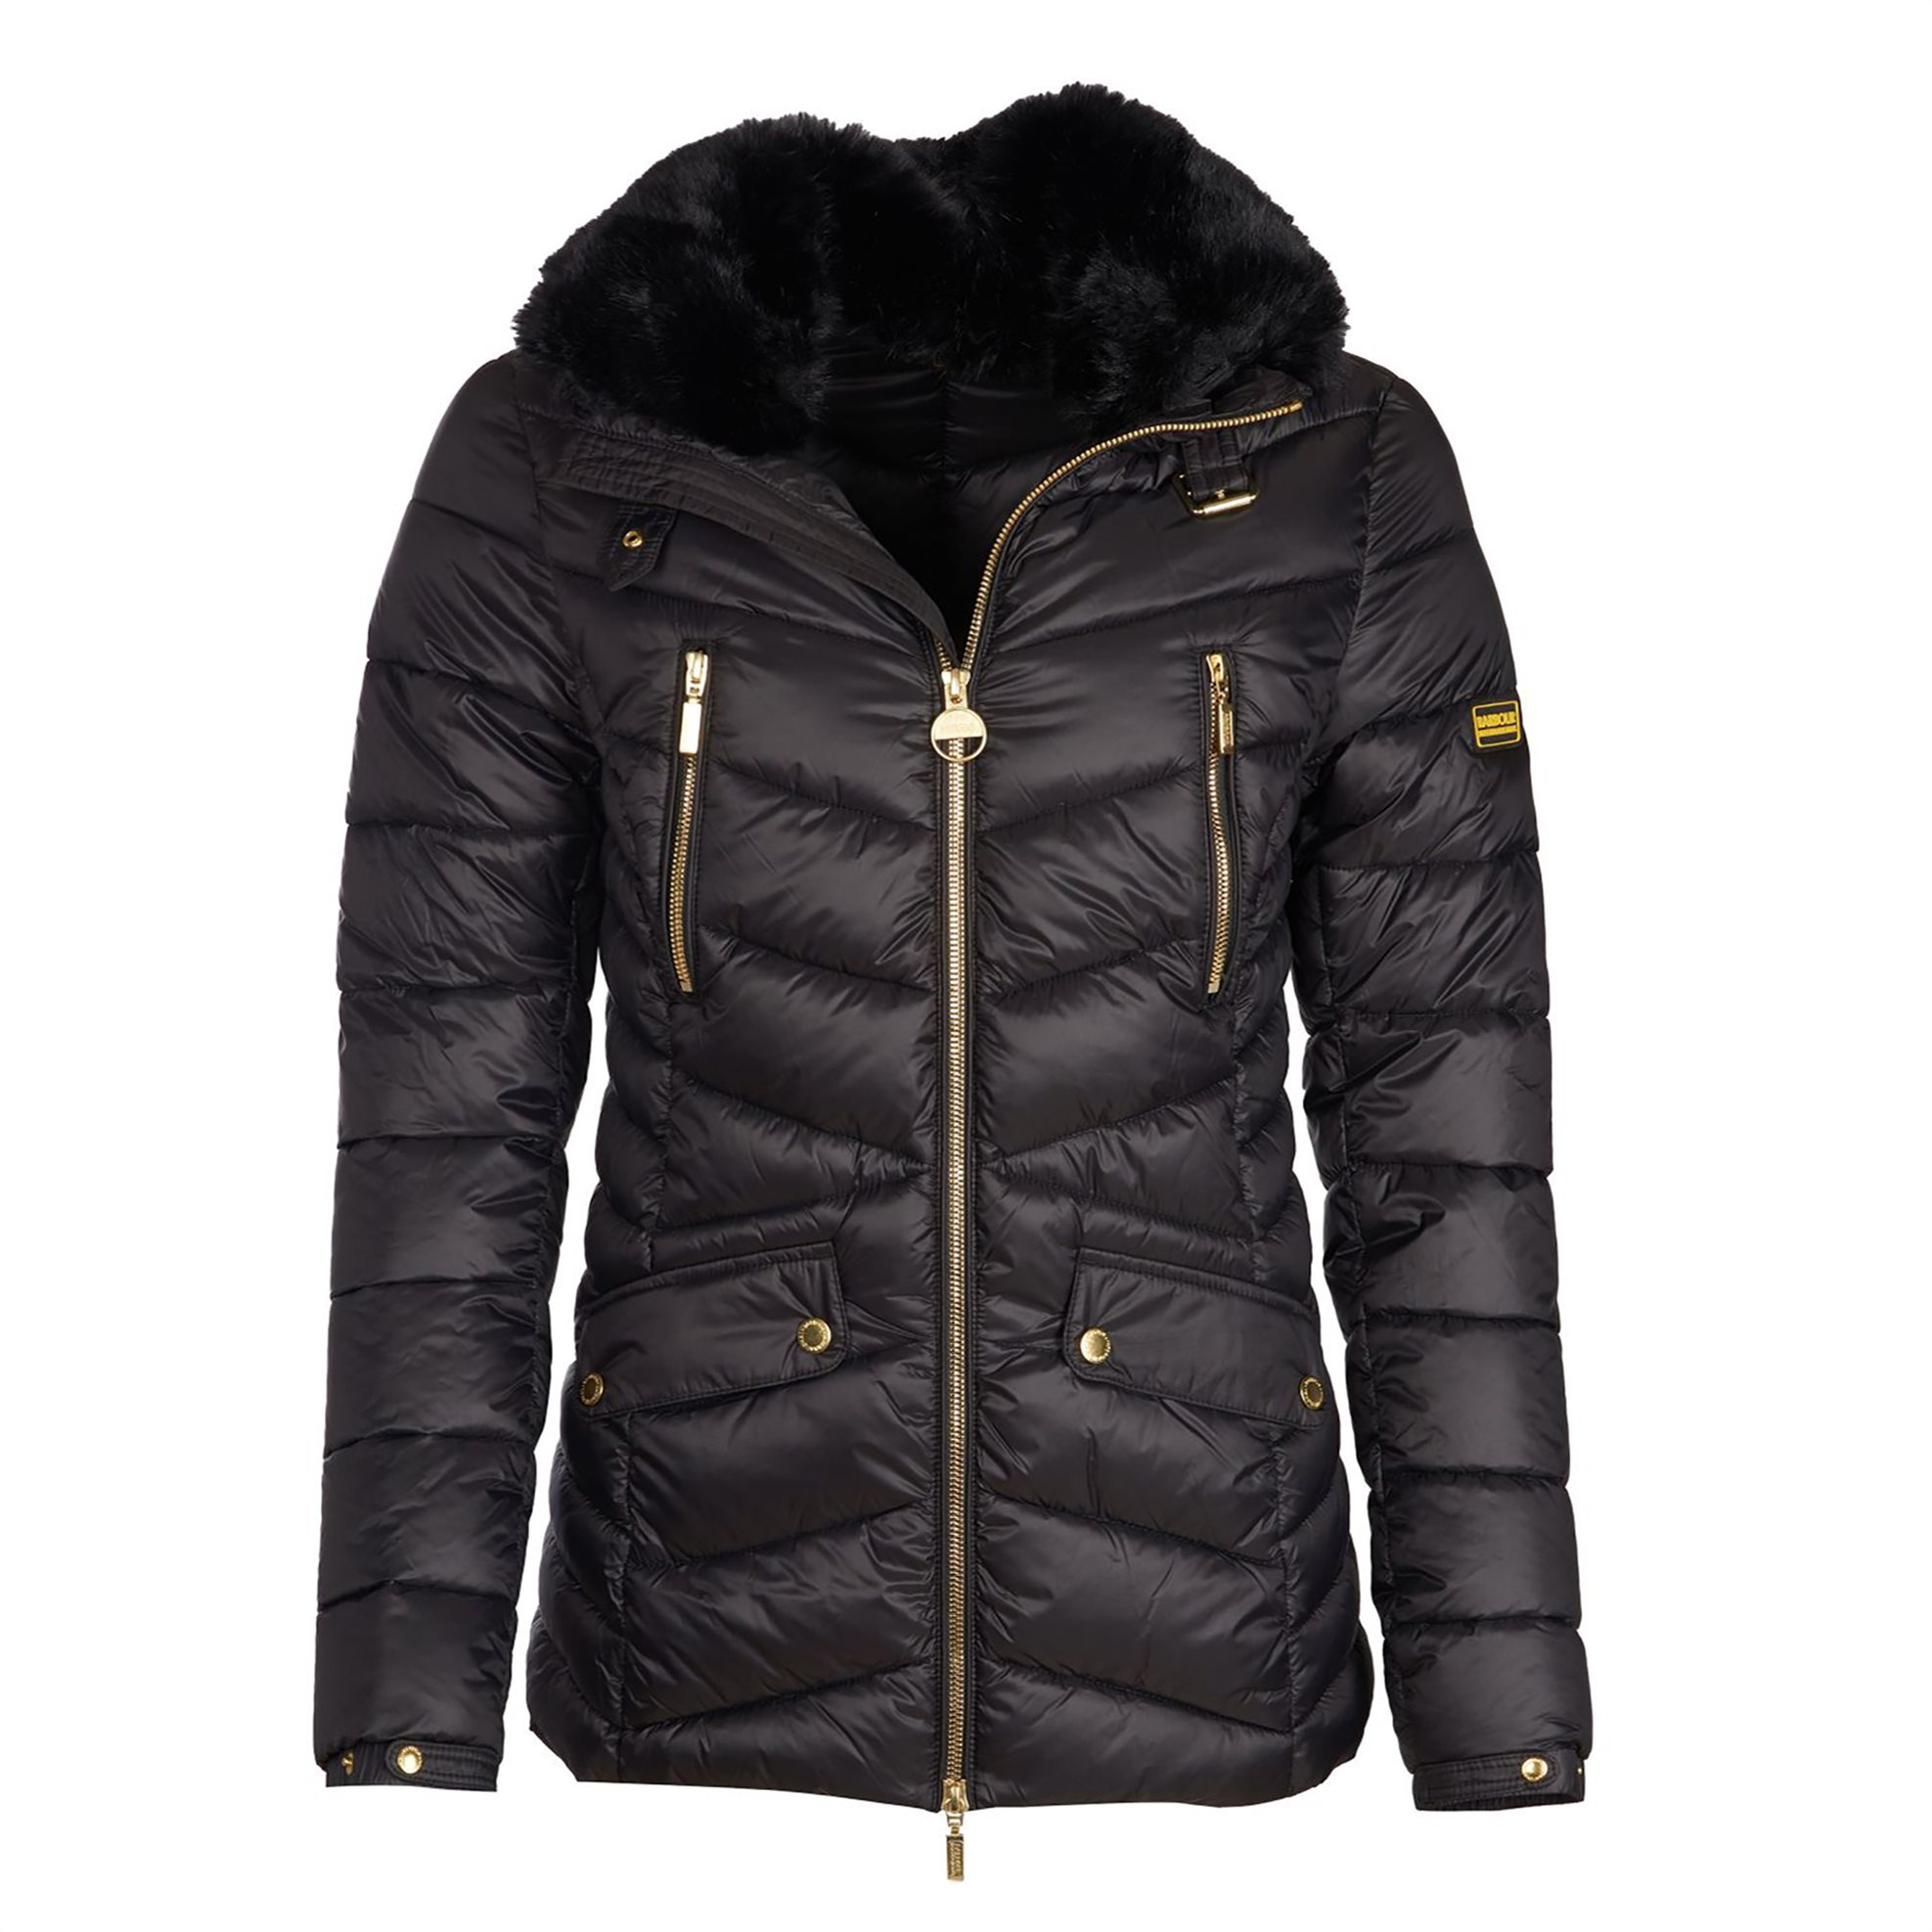 Barbour γυναικείο καπιτονέ μπουφάν Autocross - LQU0938 - Μαύρο γυναικα   ρουχα   πανωφόρια   μπουφάν   σακάκια   μπουφάν